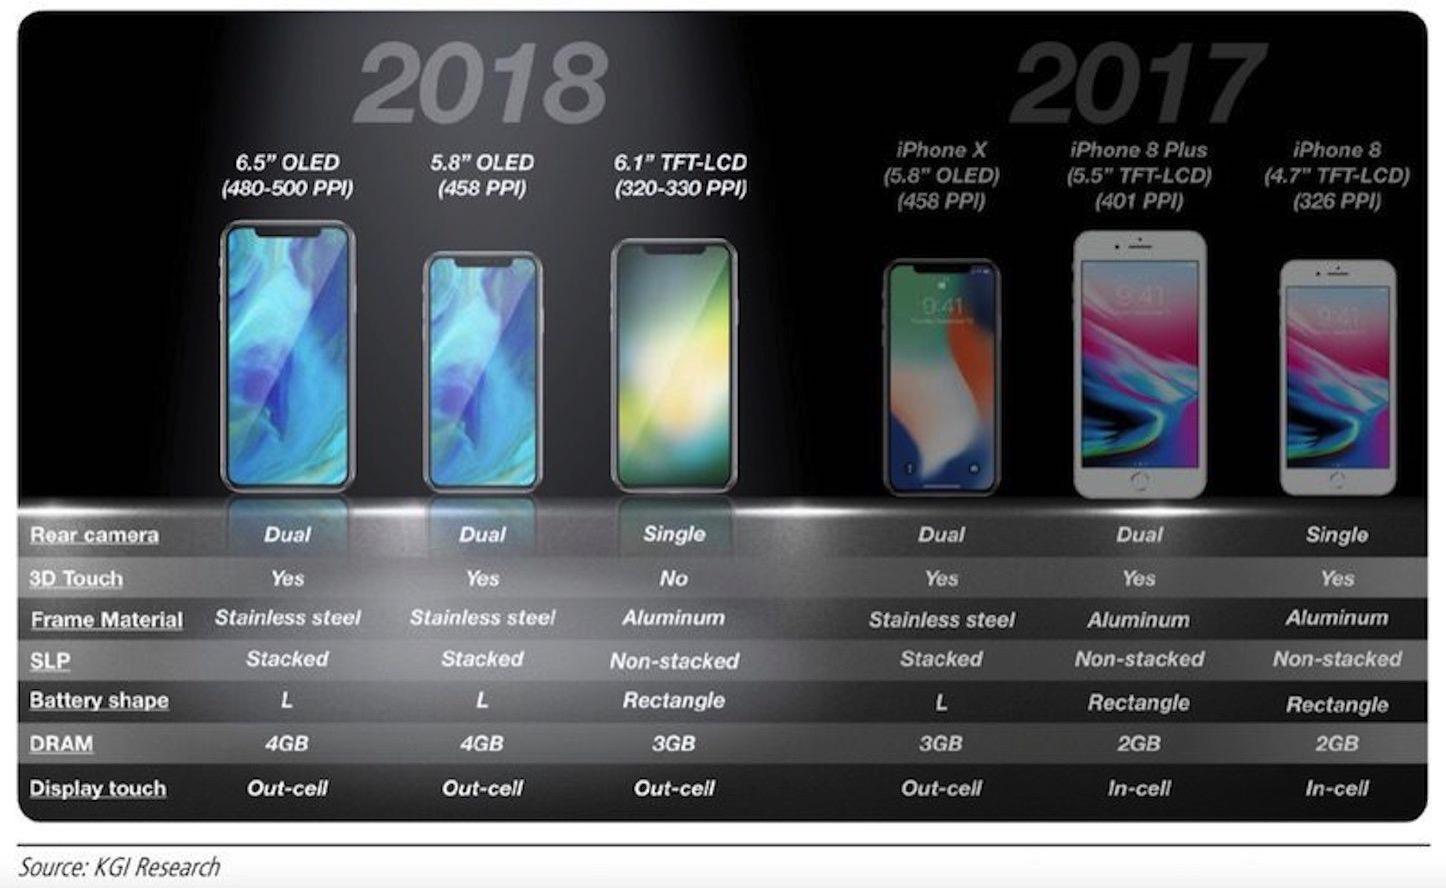 iphones-2018-kgi.jpg